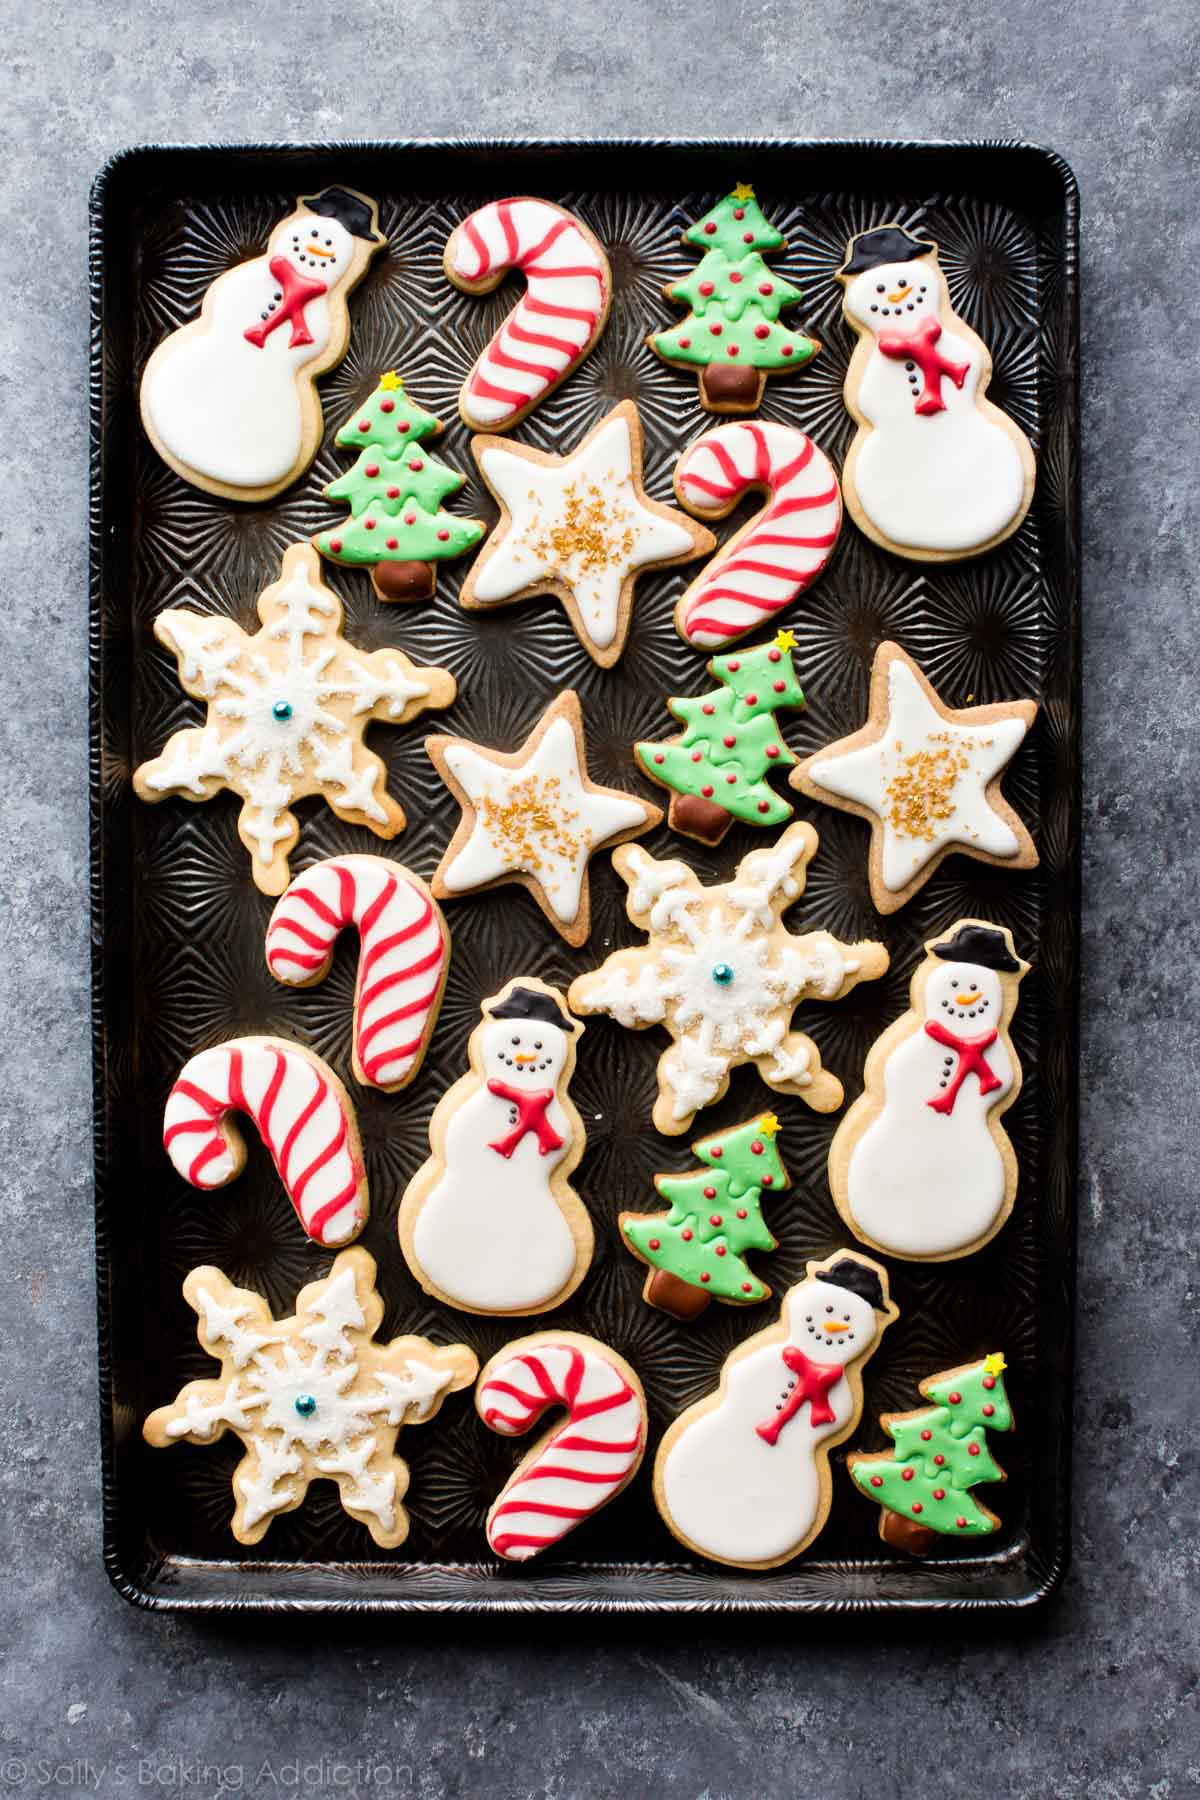 Decorated Christmas Sugar Cookies  1 Sugar Cookie Dough 5 Ways to Decorate Sallys Baking